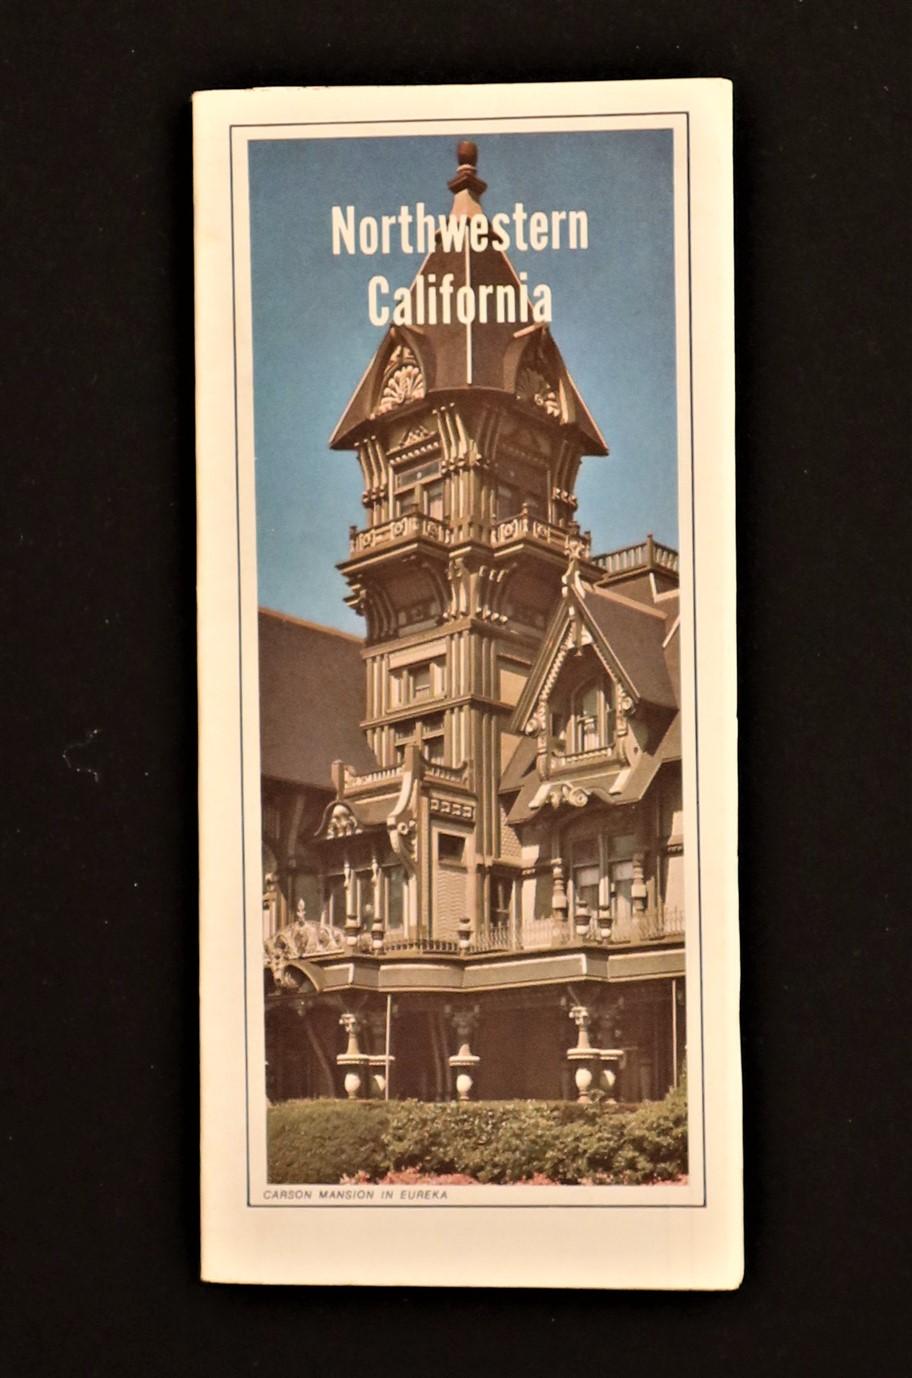 Auto Club California State Auto Association Northwestern California 1987